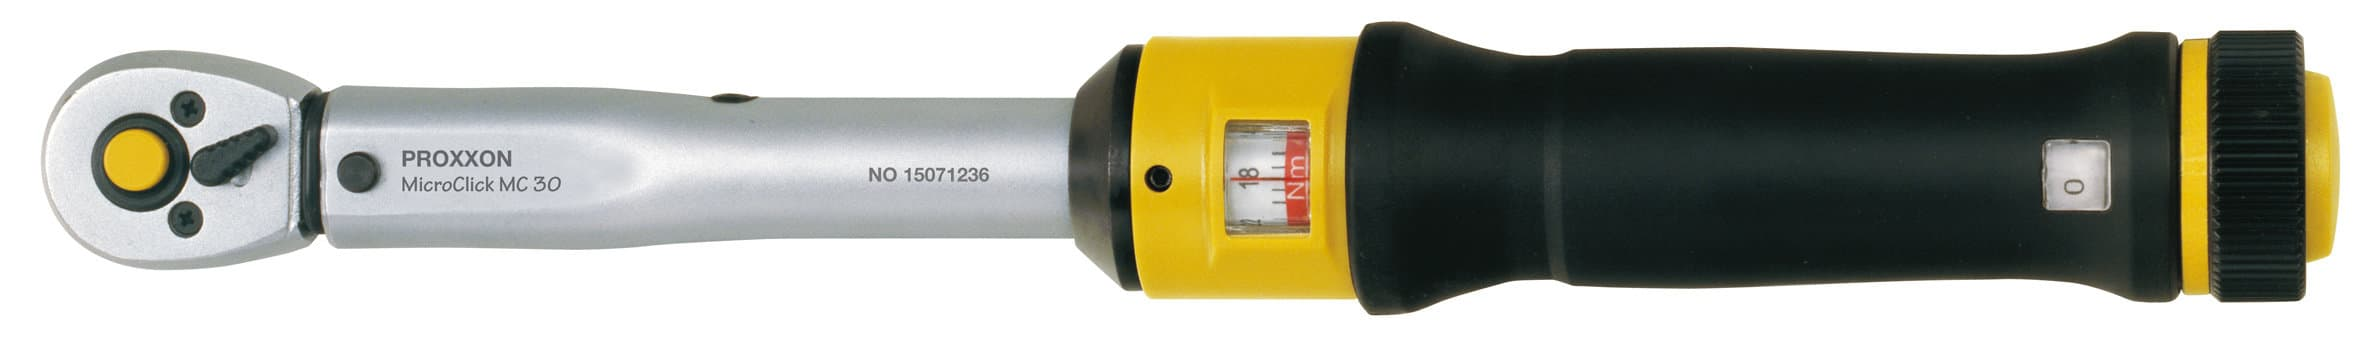 "Proxxon Chiave dinamometrica MicroClick MC 30, 6 - 30 Nm, 1/4"""